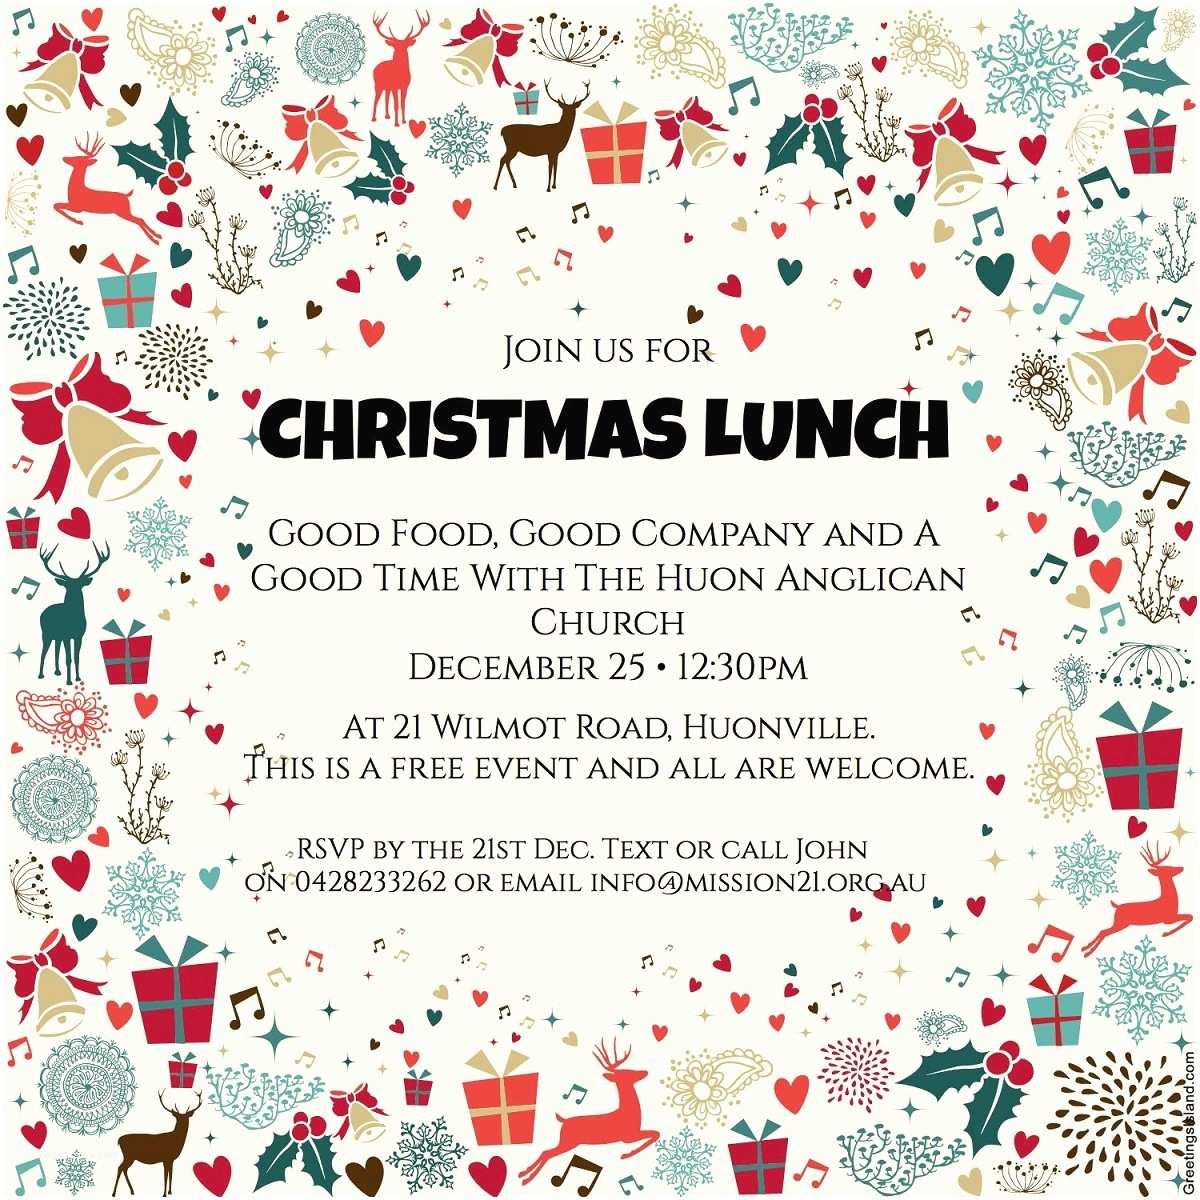 Free Holiday Party Invitation Templates 46 Beautiful Christmas Invitation Templates Twihot